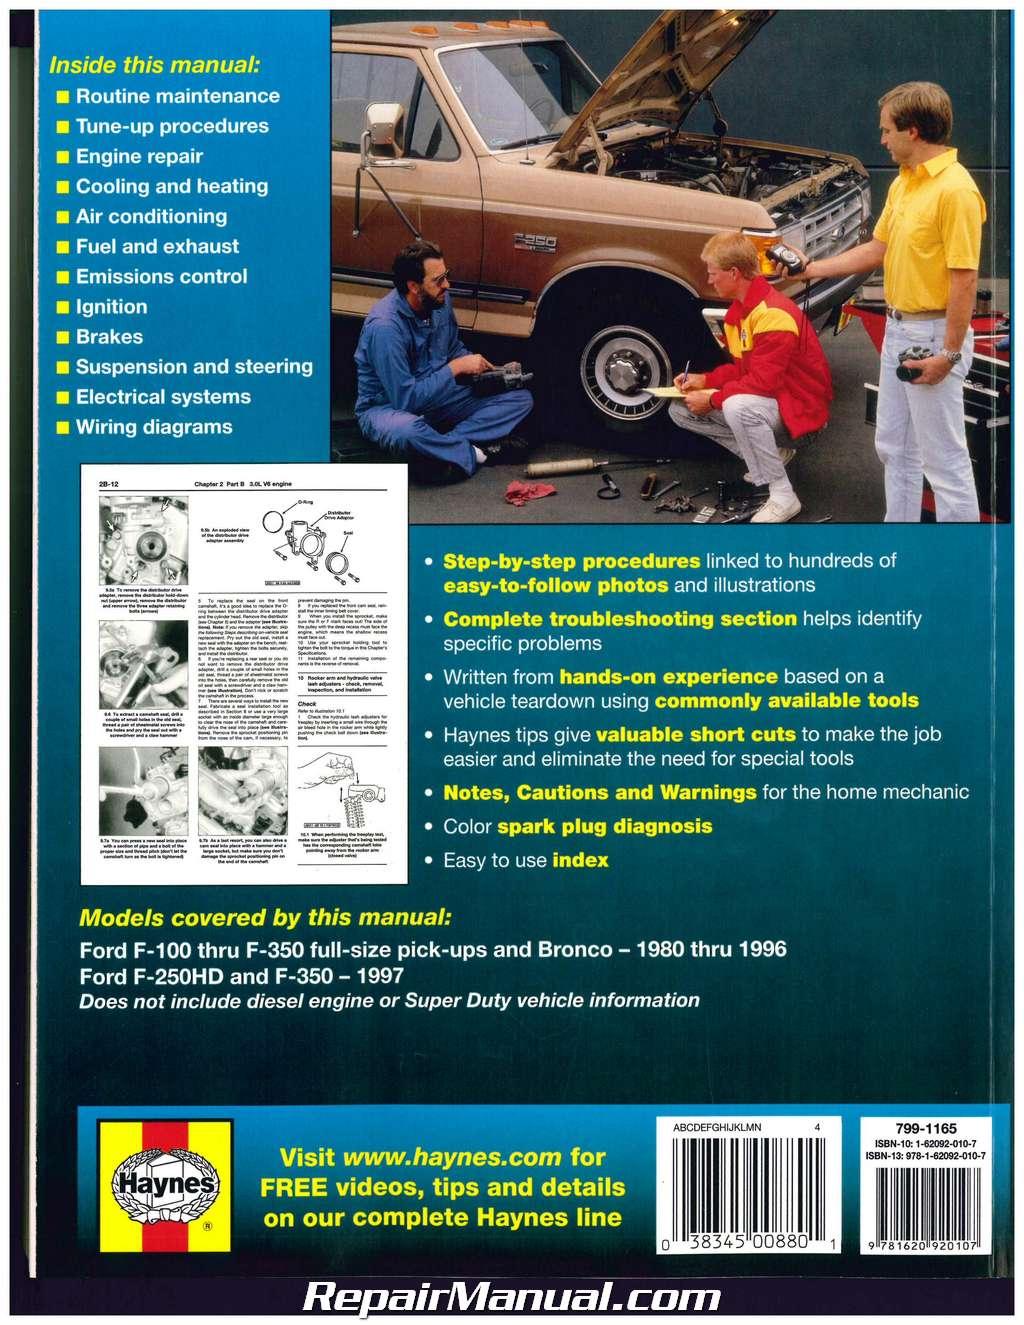 Ford Pickup Trucks Bronco 2wd 4wd 1980 1997 Haynes Auto Repair Manual Full Size